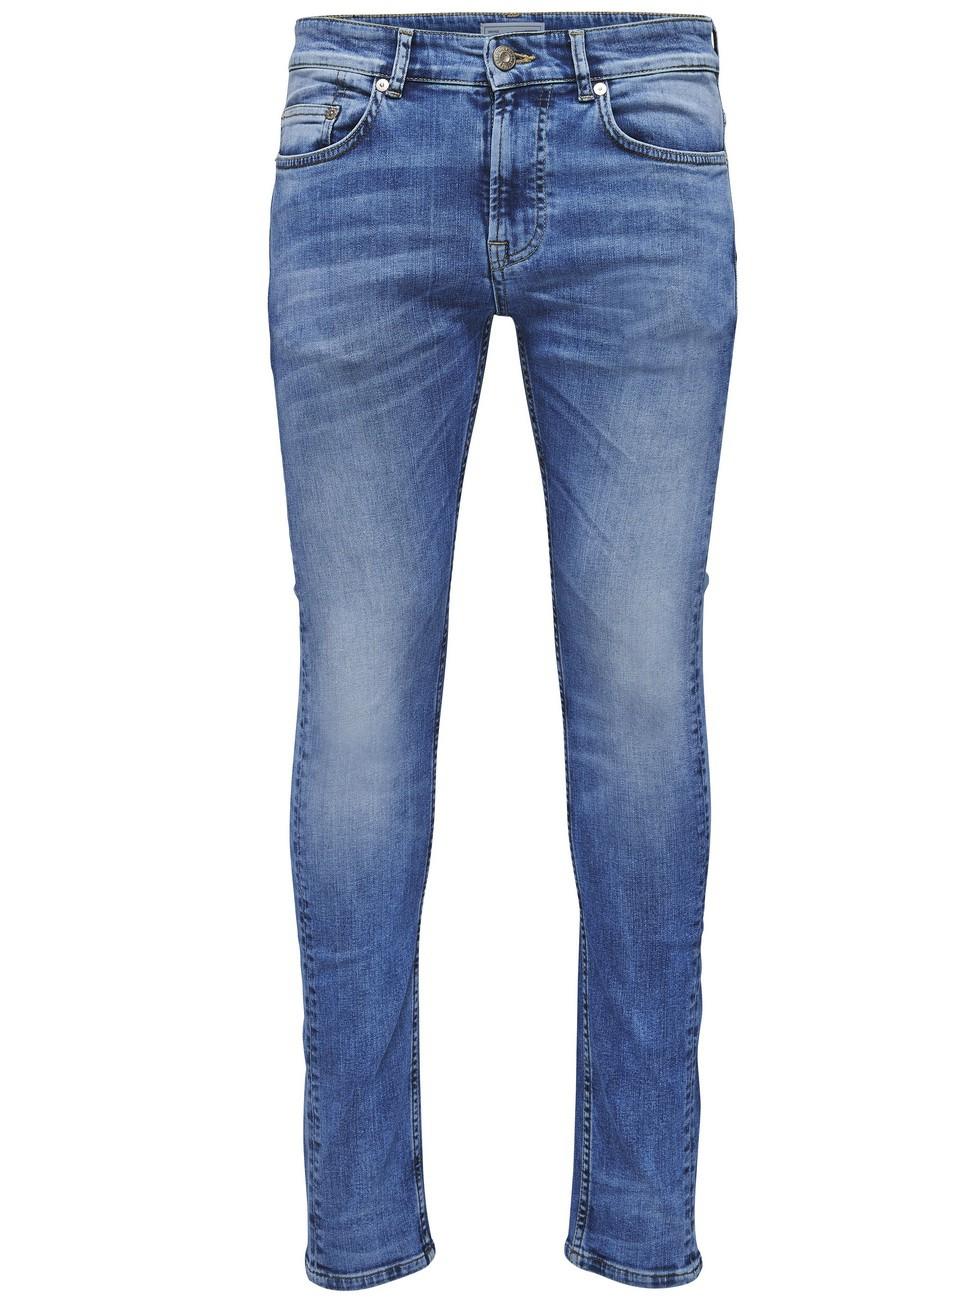 Only & Sons Herren Jeans onsWEFT - Regular Fit - Blau - Medium Blue Denim